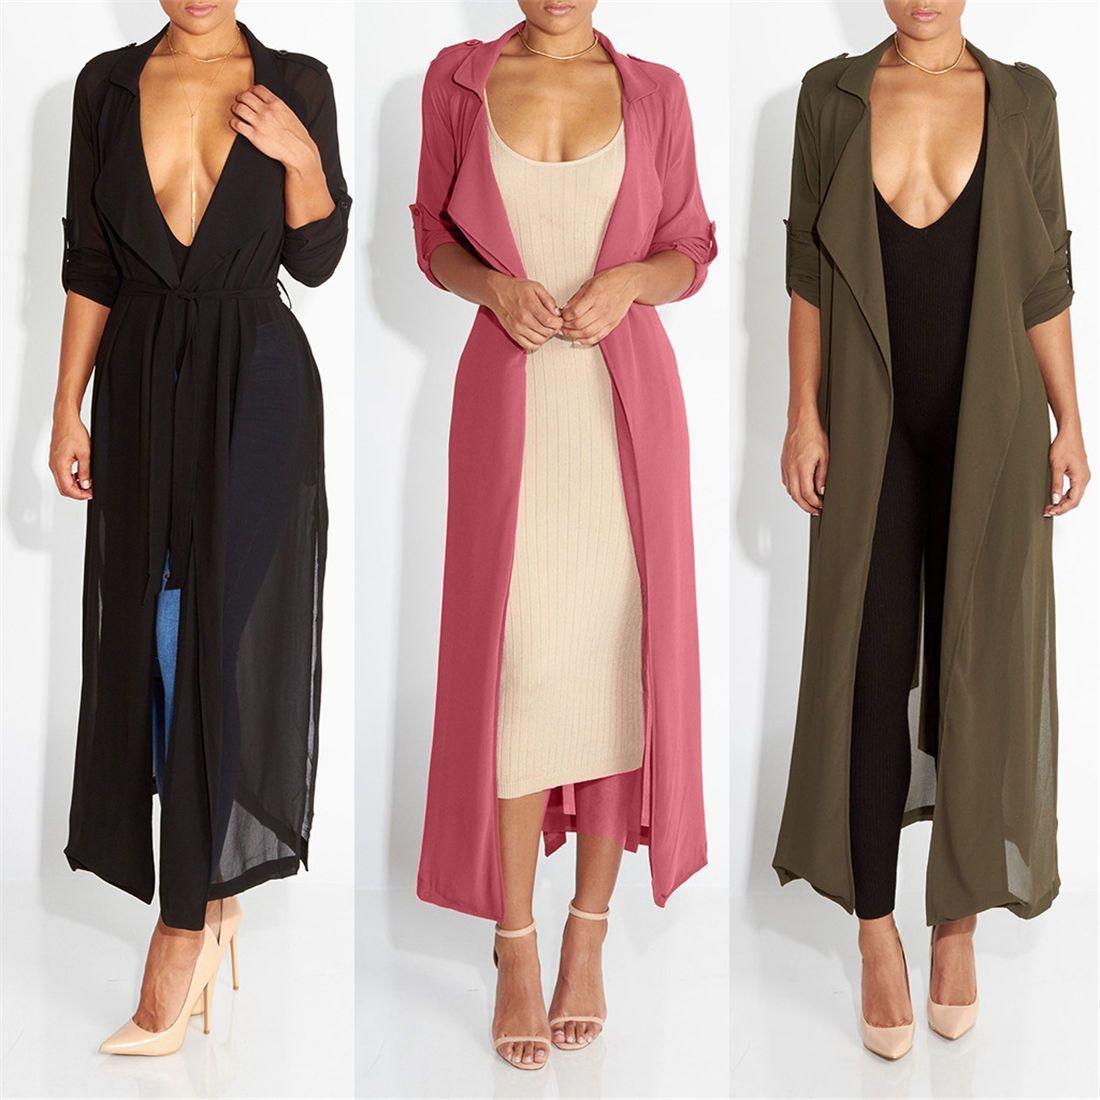 3df53ccadb5 Women s Lapel Roll-Up Long Sleeve Belted Trench Coat Full Length Chiffon  Jacket